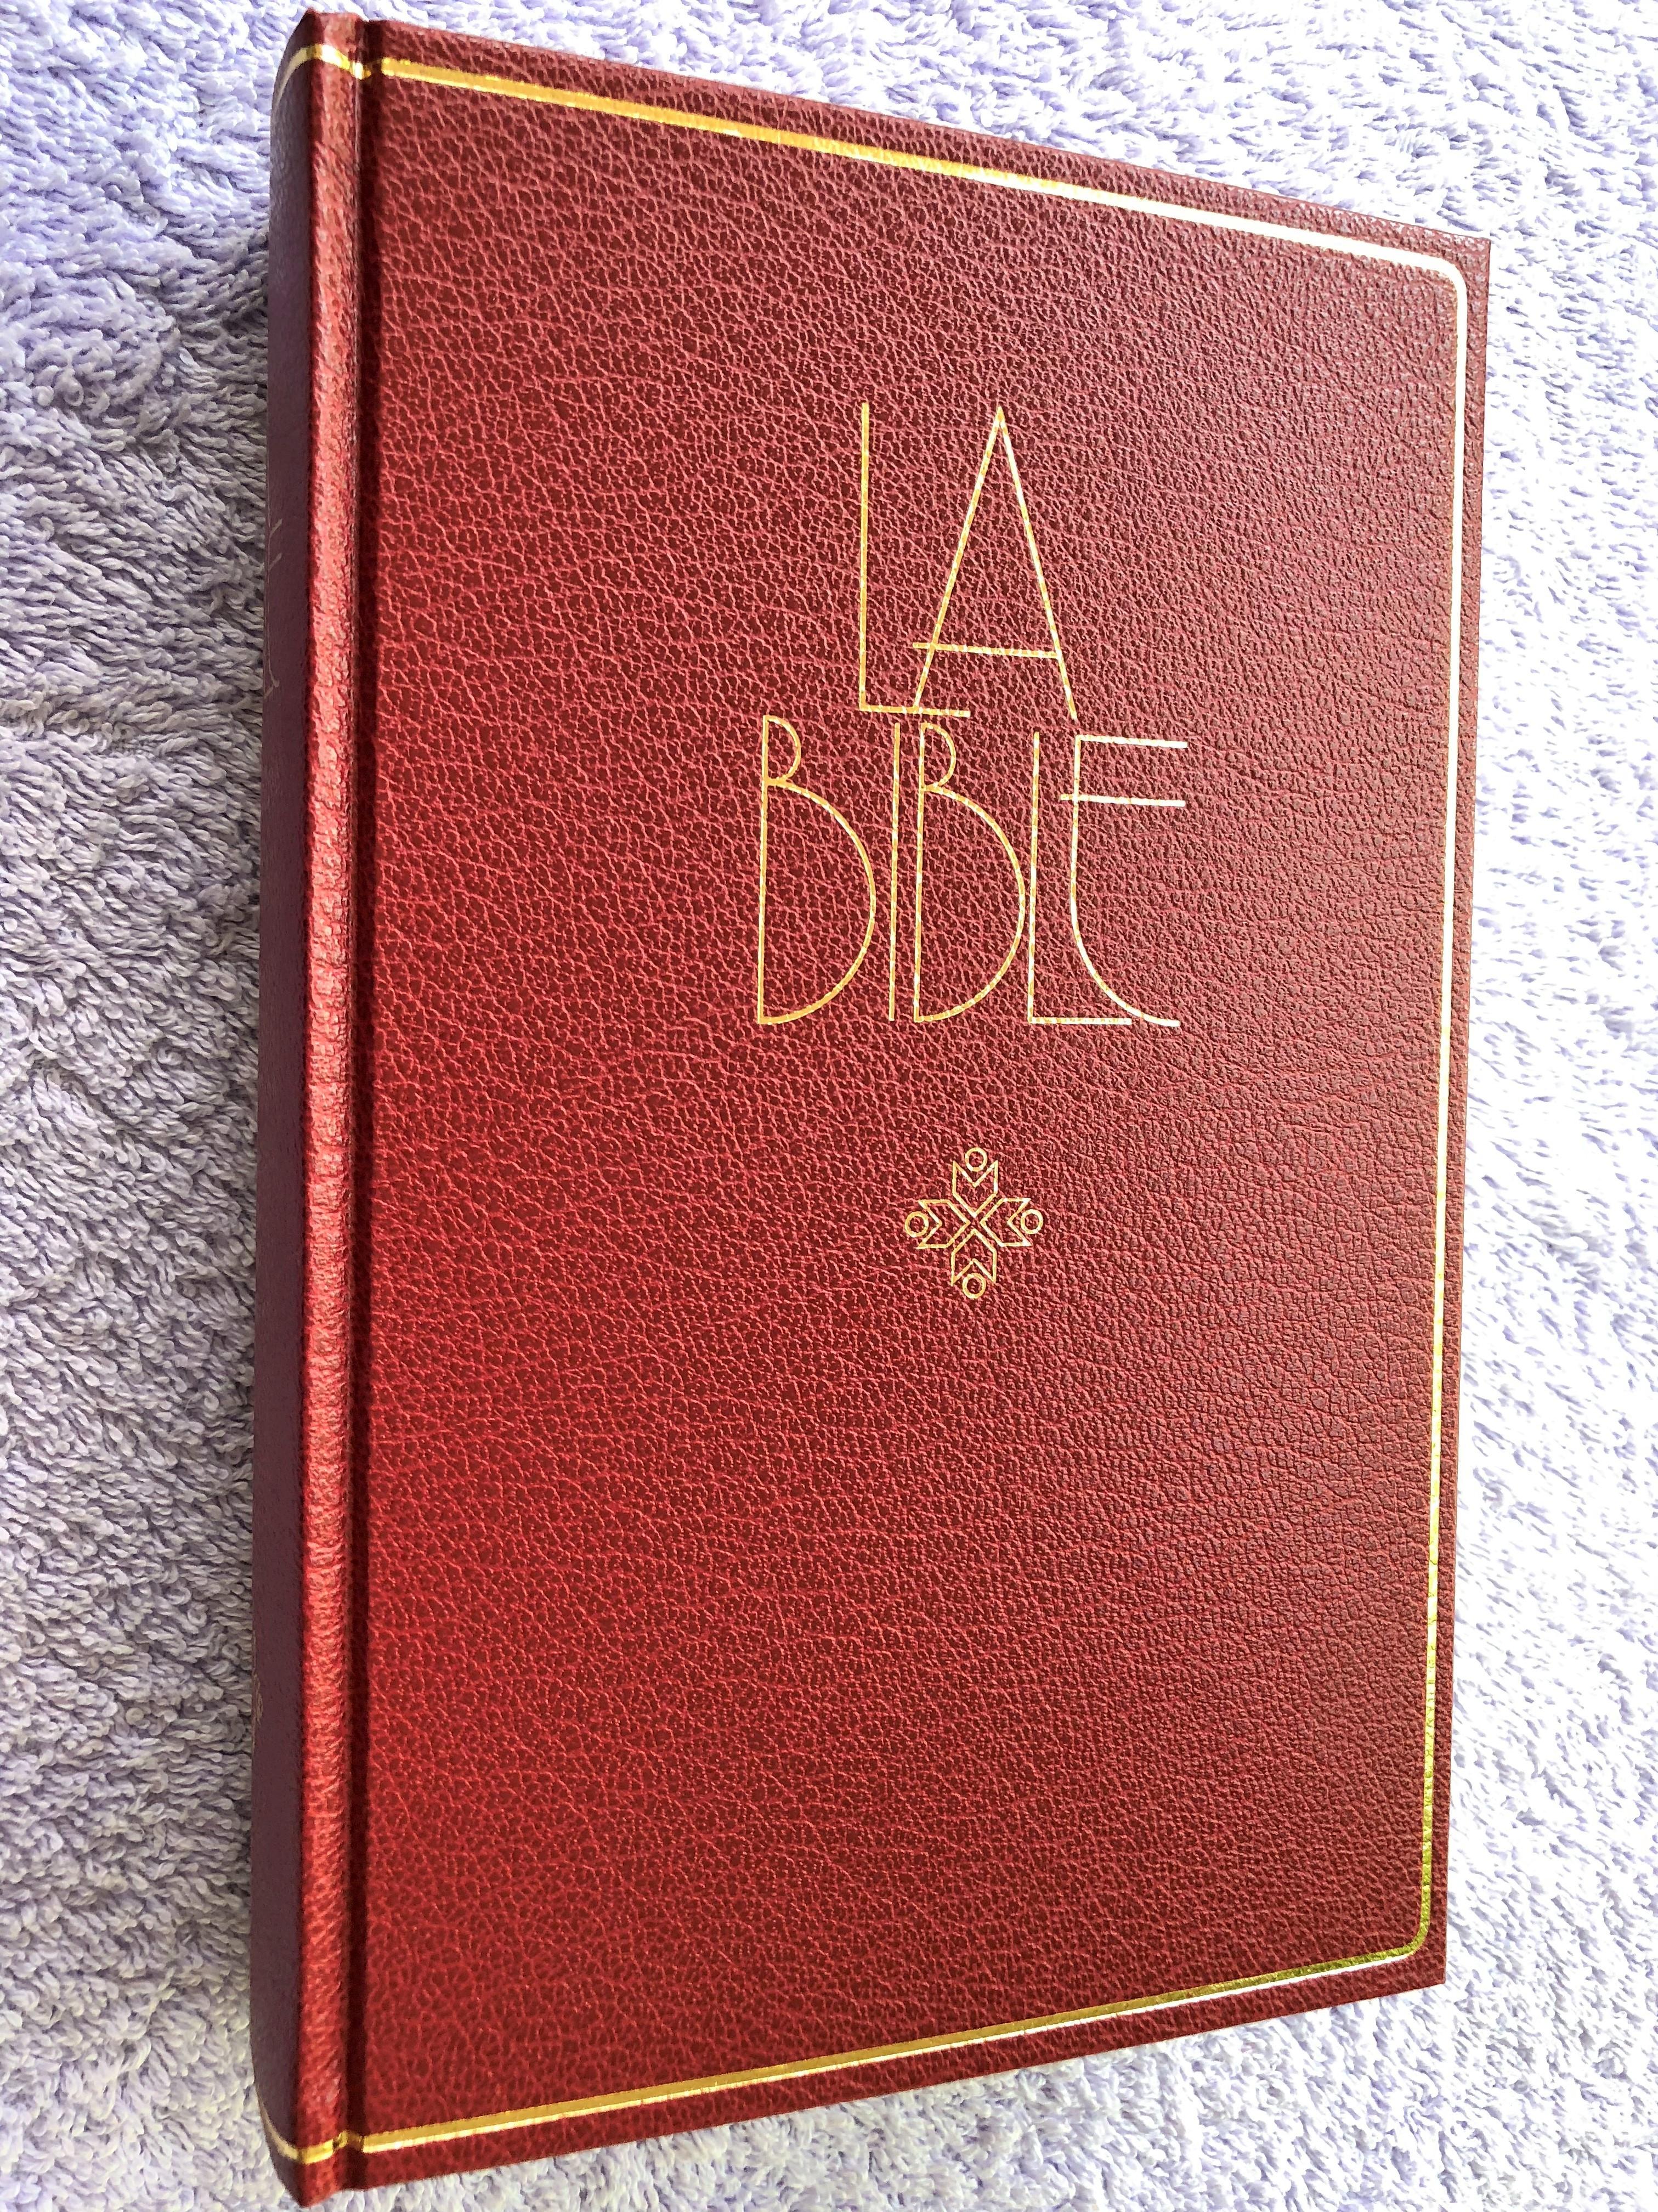 french-bible-1994-print-fch063-1-.jpg